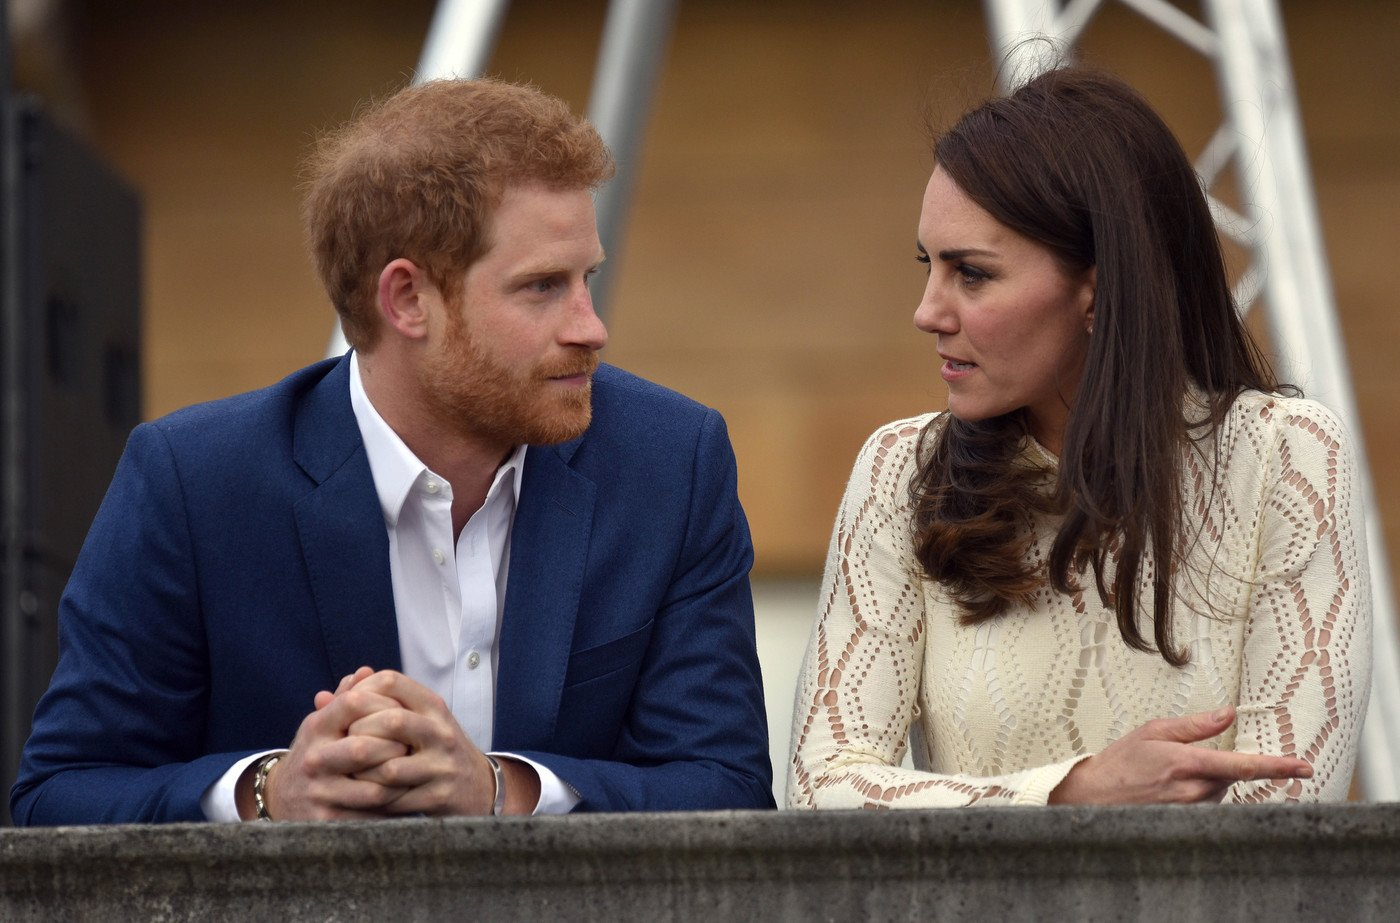 Гарри искал одобрения Кейт перед предложением Меган